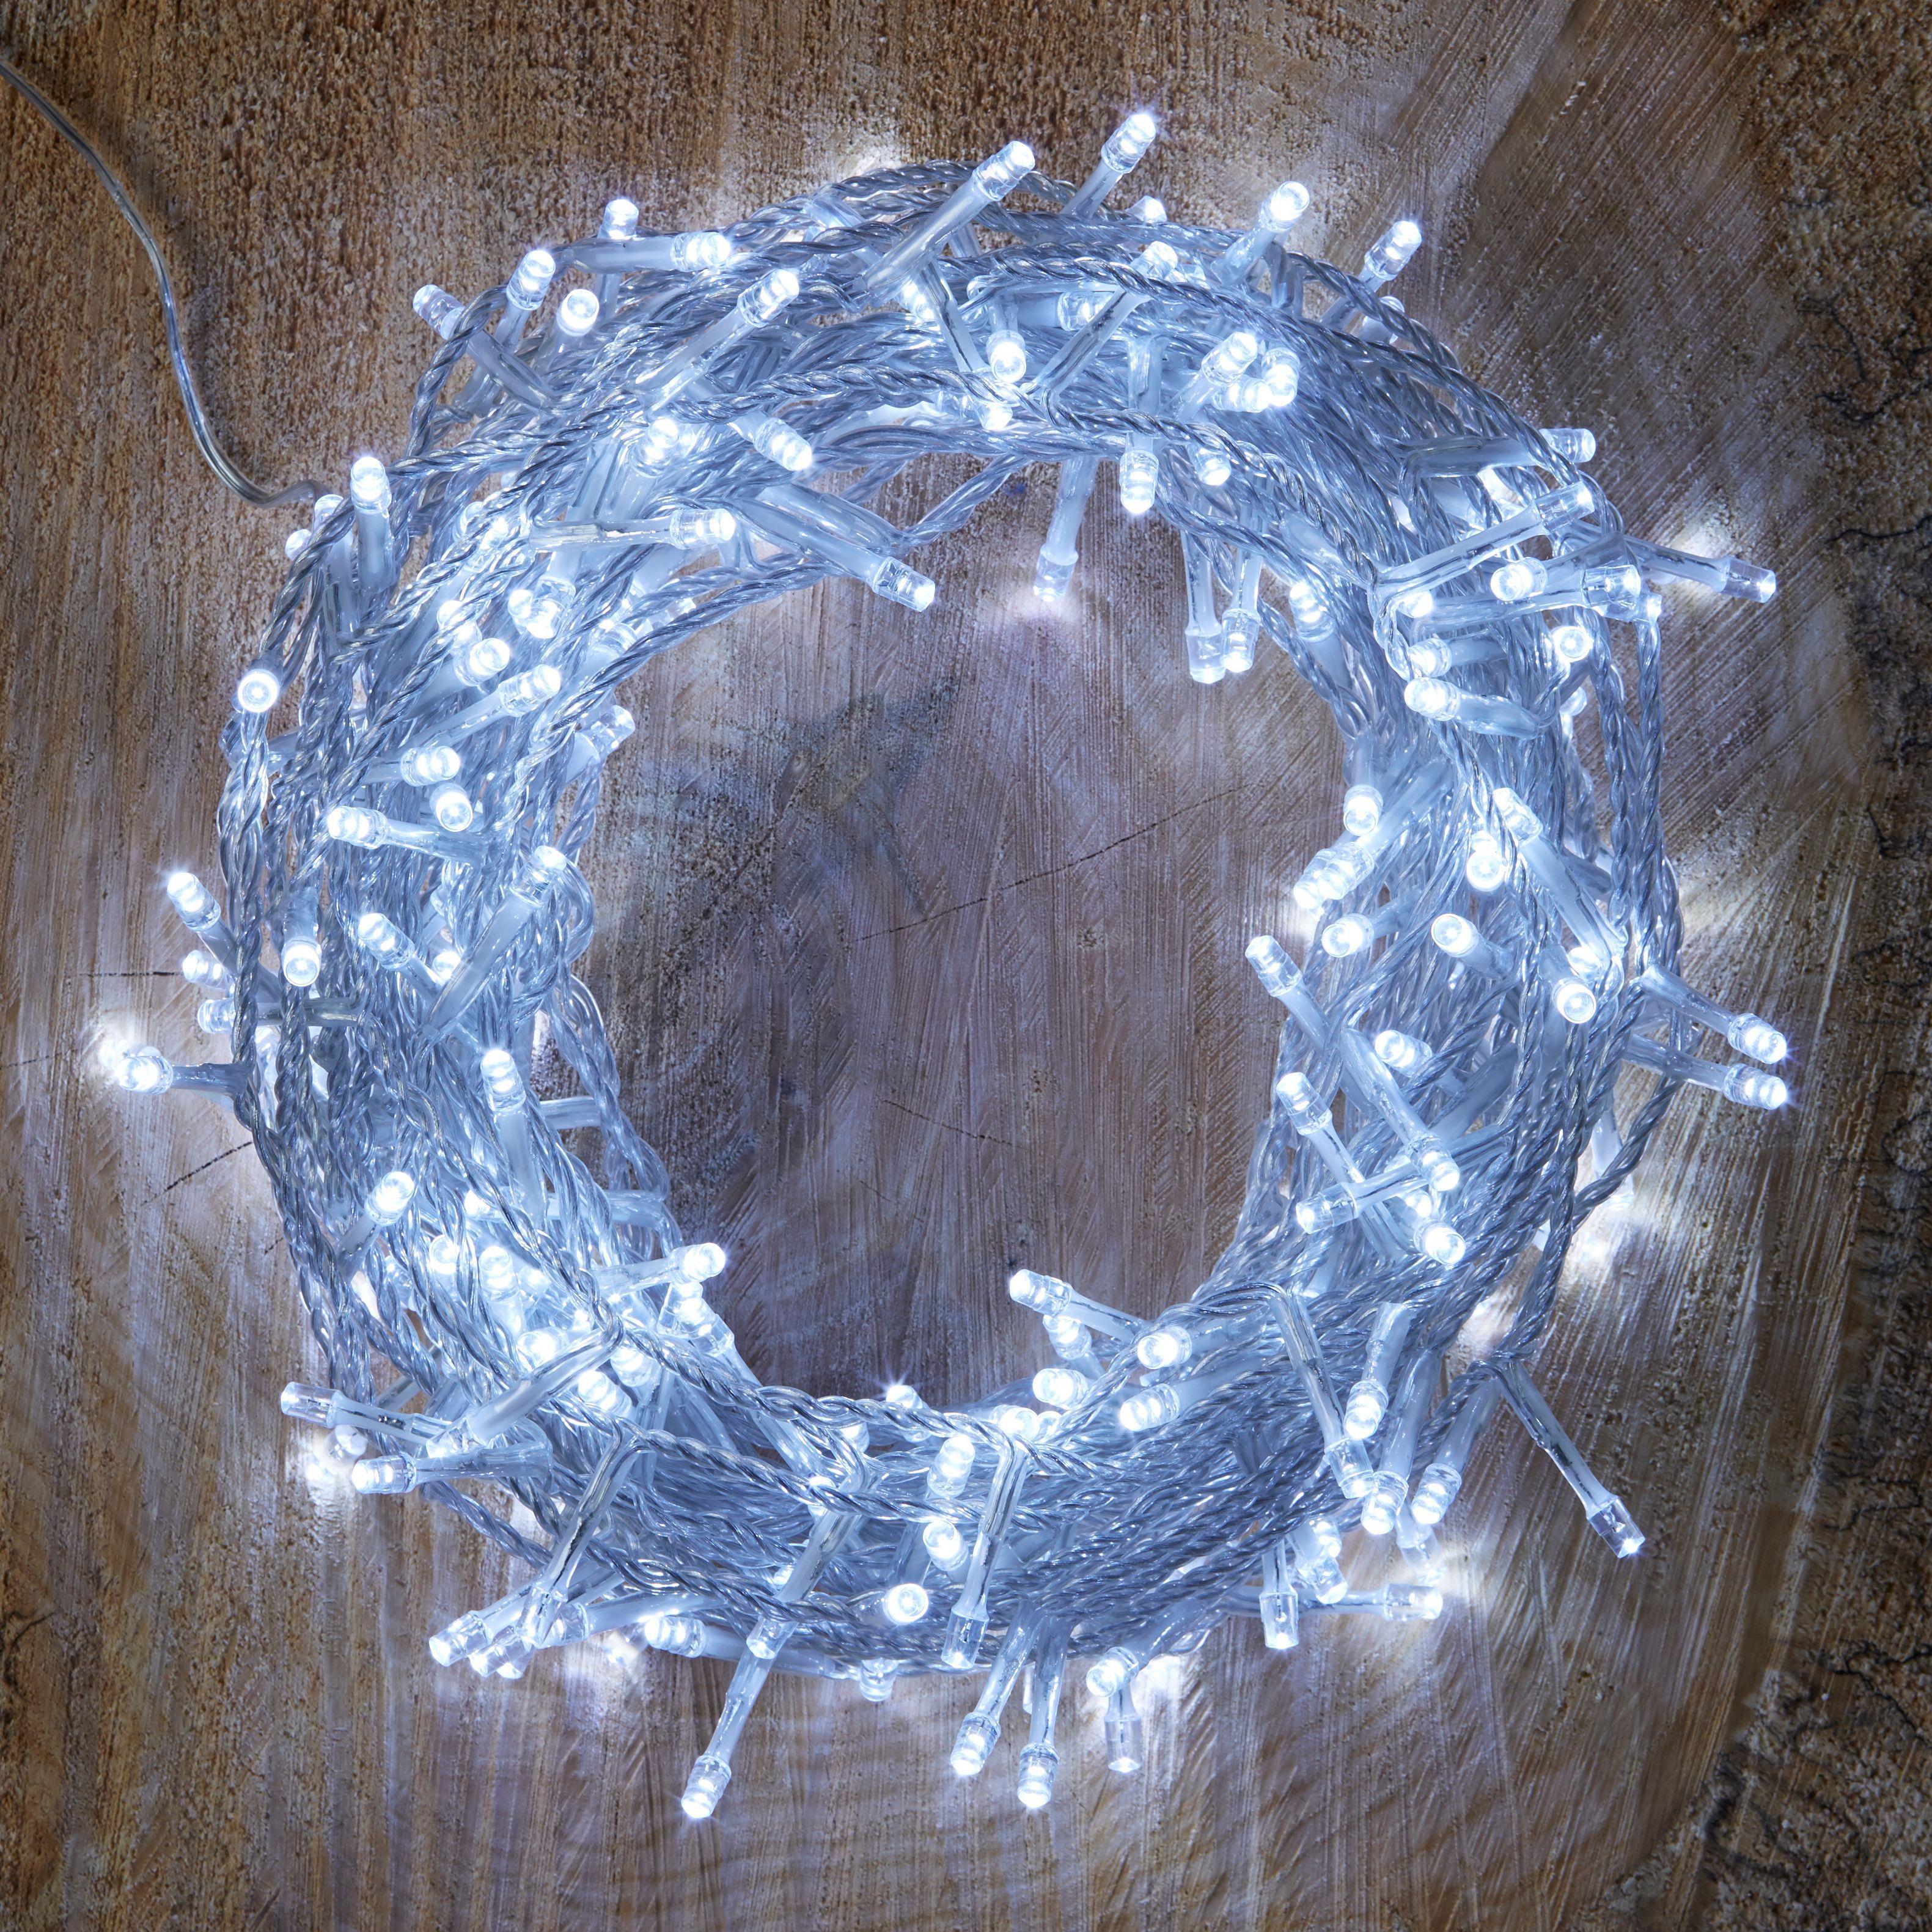 String Lights B And Q : 240 Ice White LED String Lights Departments DIY at B&Q